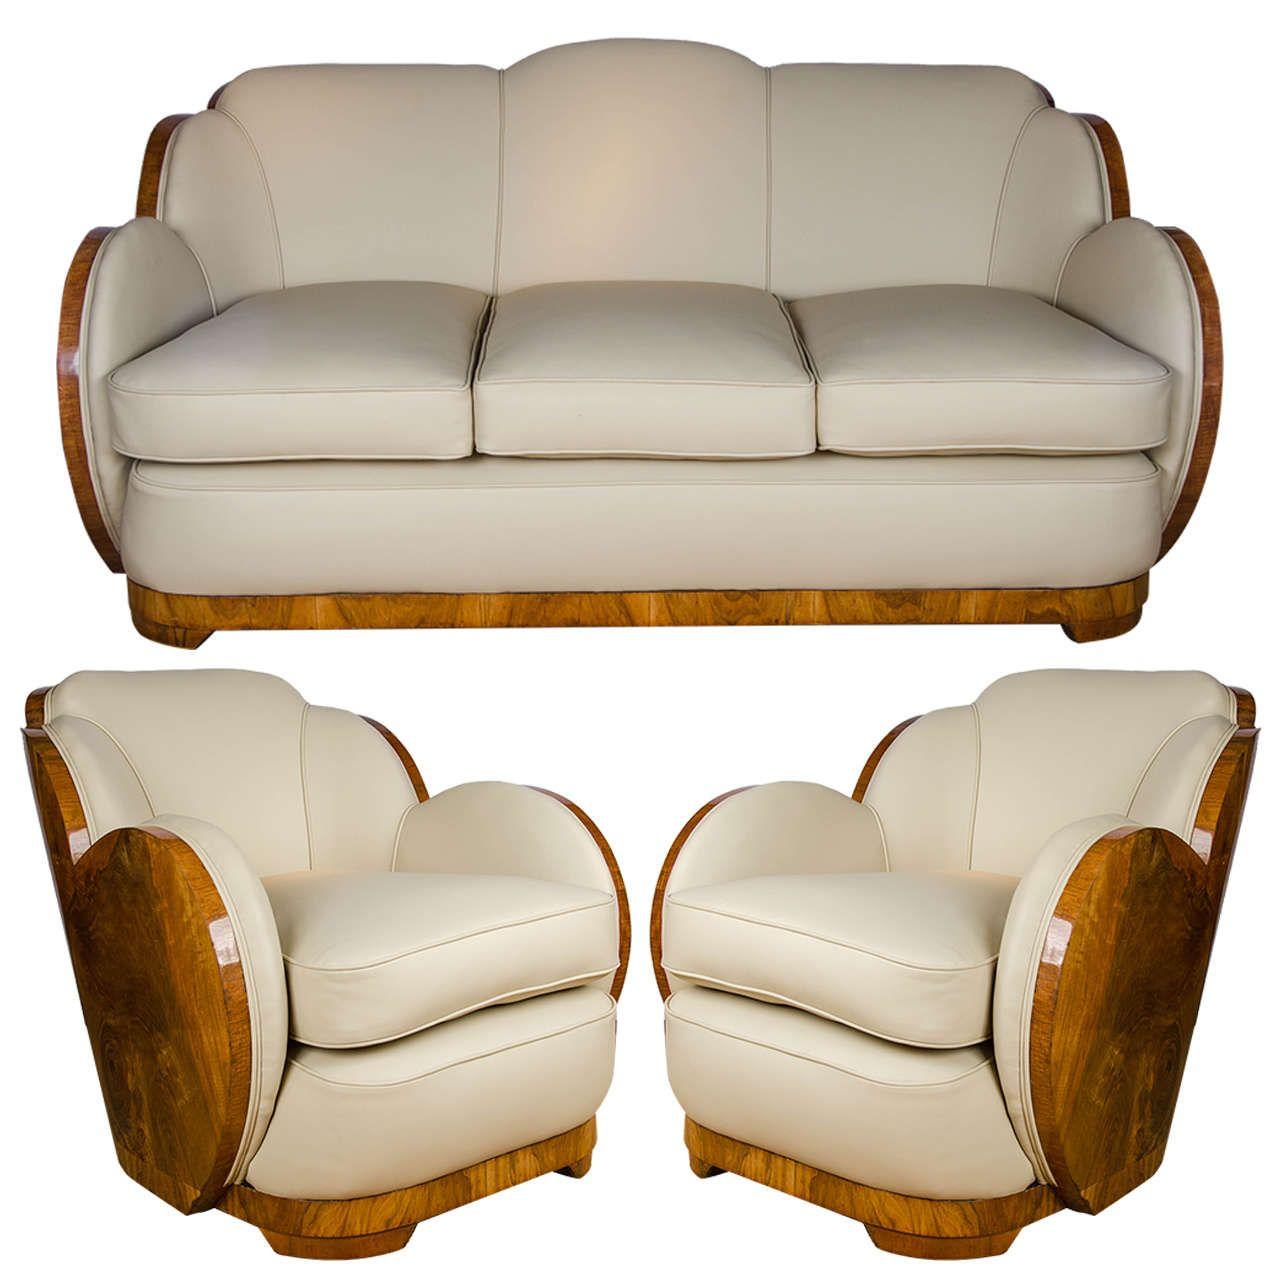 Art Deco Three-Piece Suite Sofas   Living room sets, Room set and ...